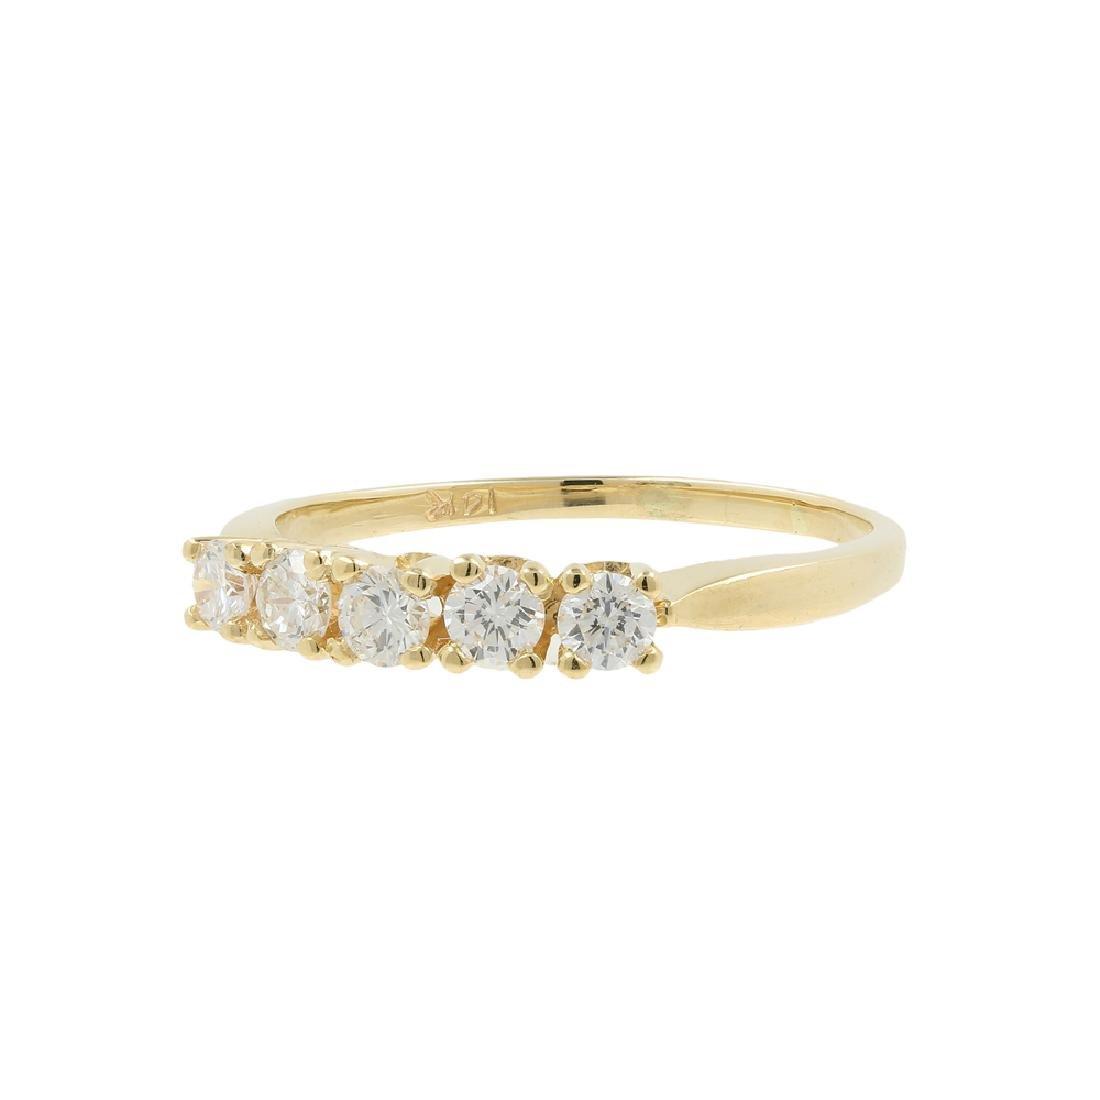 Ladies Classic Estate 14K Yellow Gold Diamond